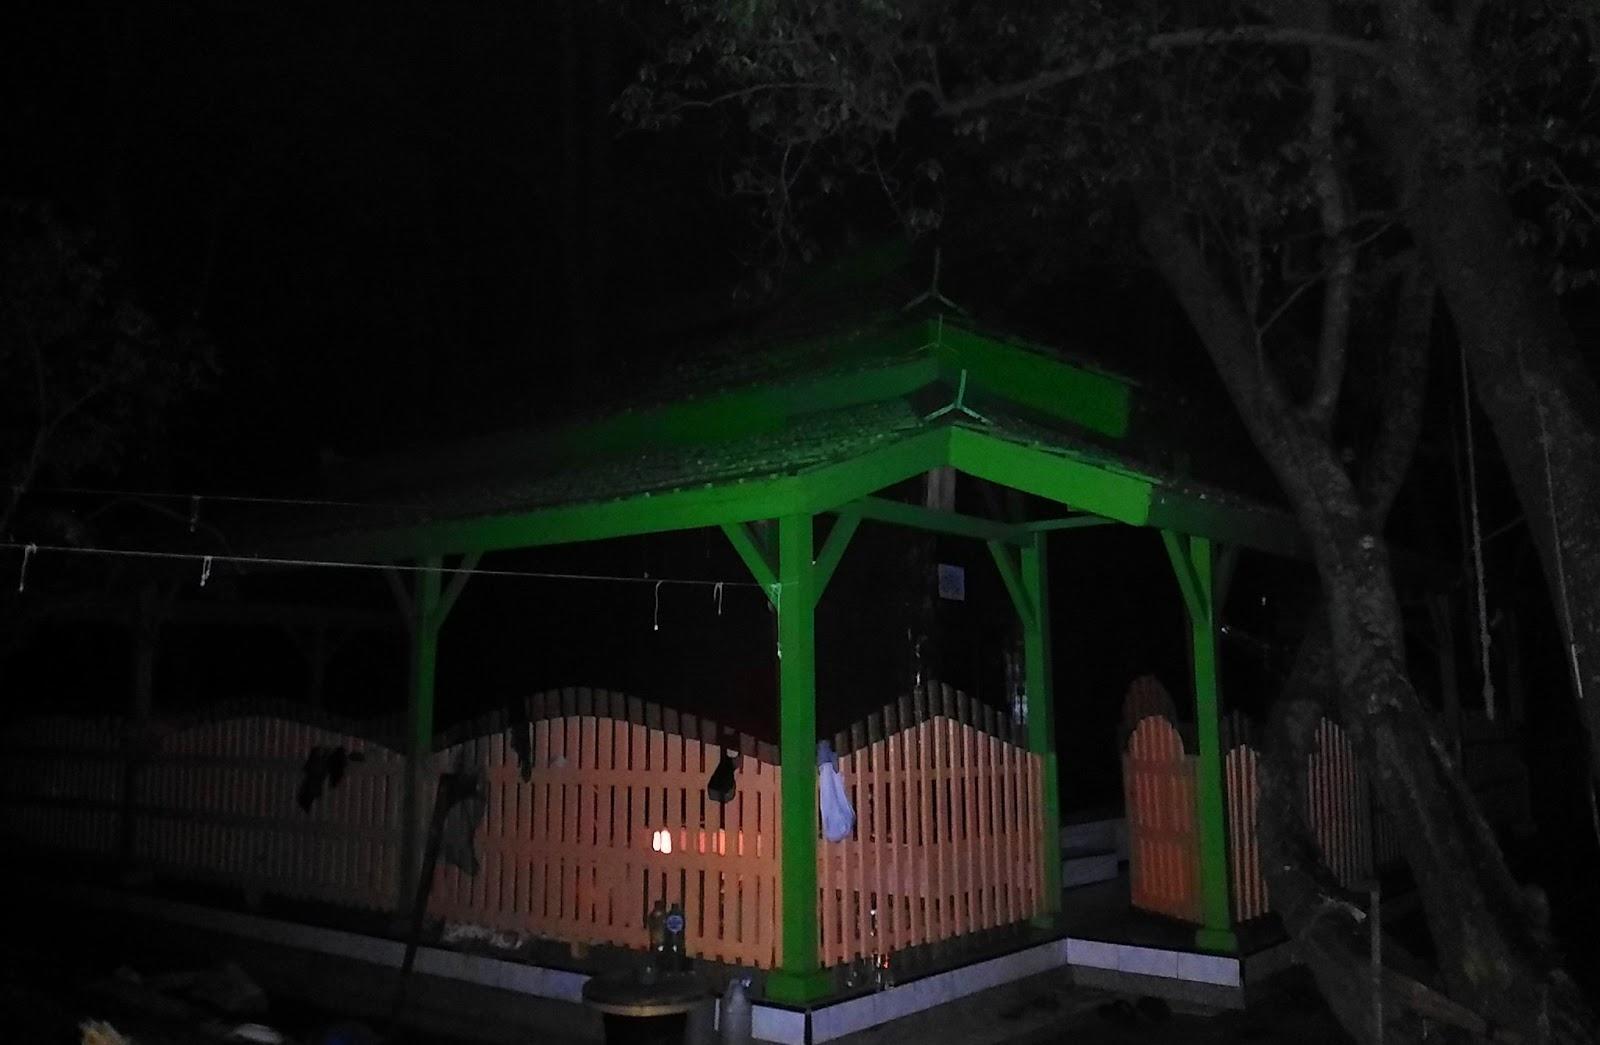 Pulau Seprapat Eksotisme Tempat Pesugihan Pati Jawa Tengah Makam Datuk